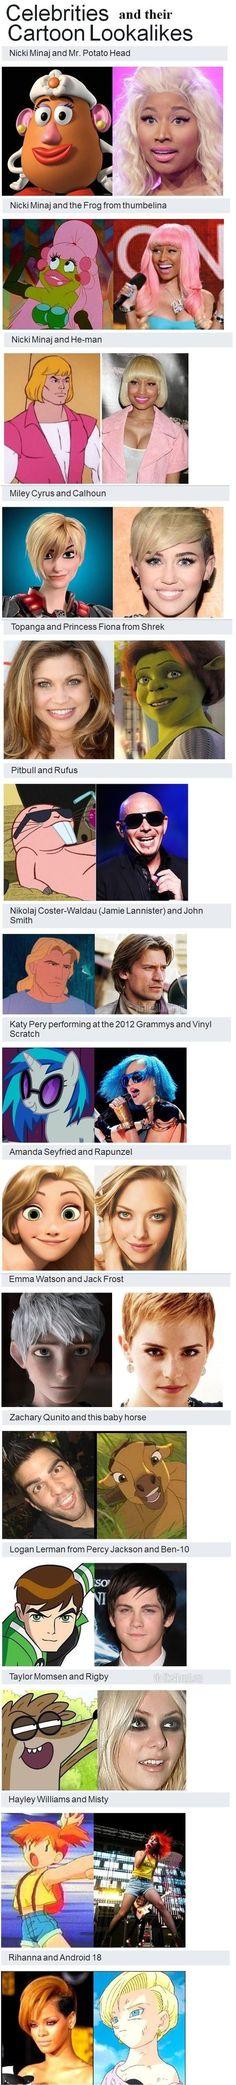 Celebrities and their cartoon look alikes